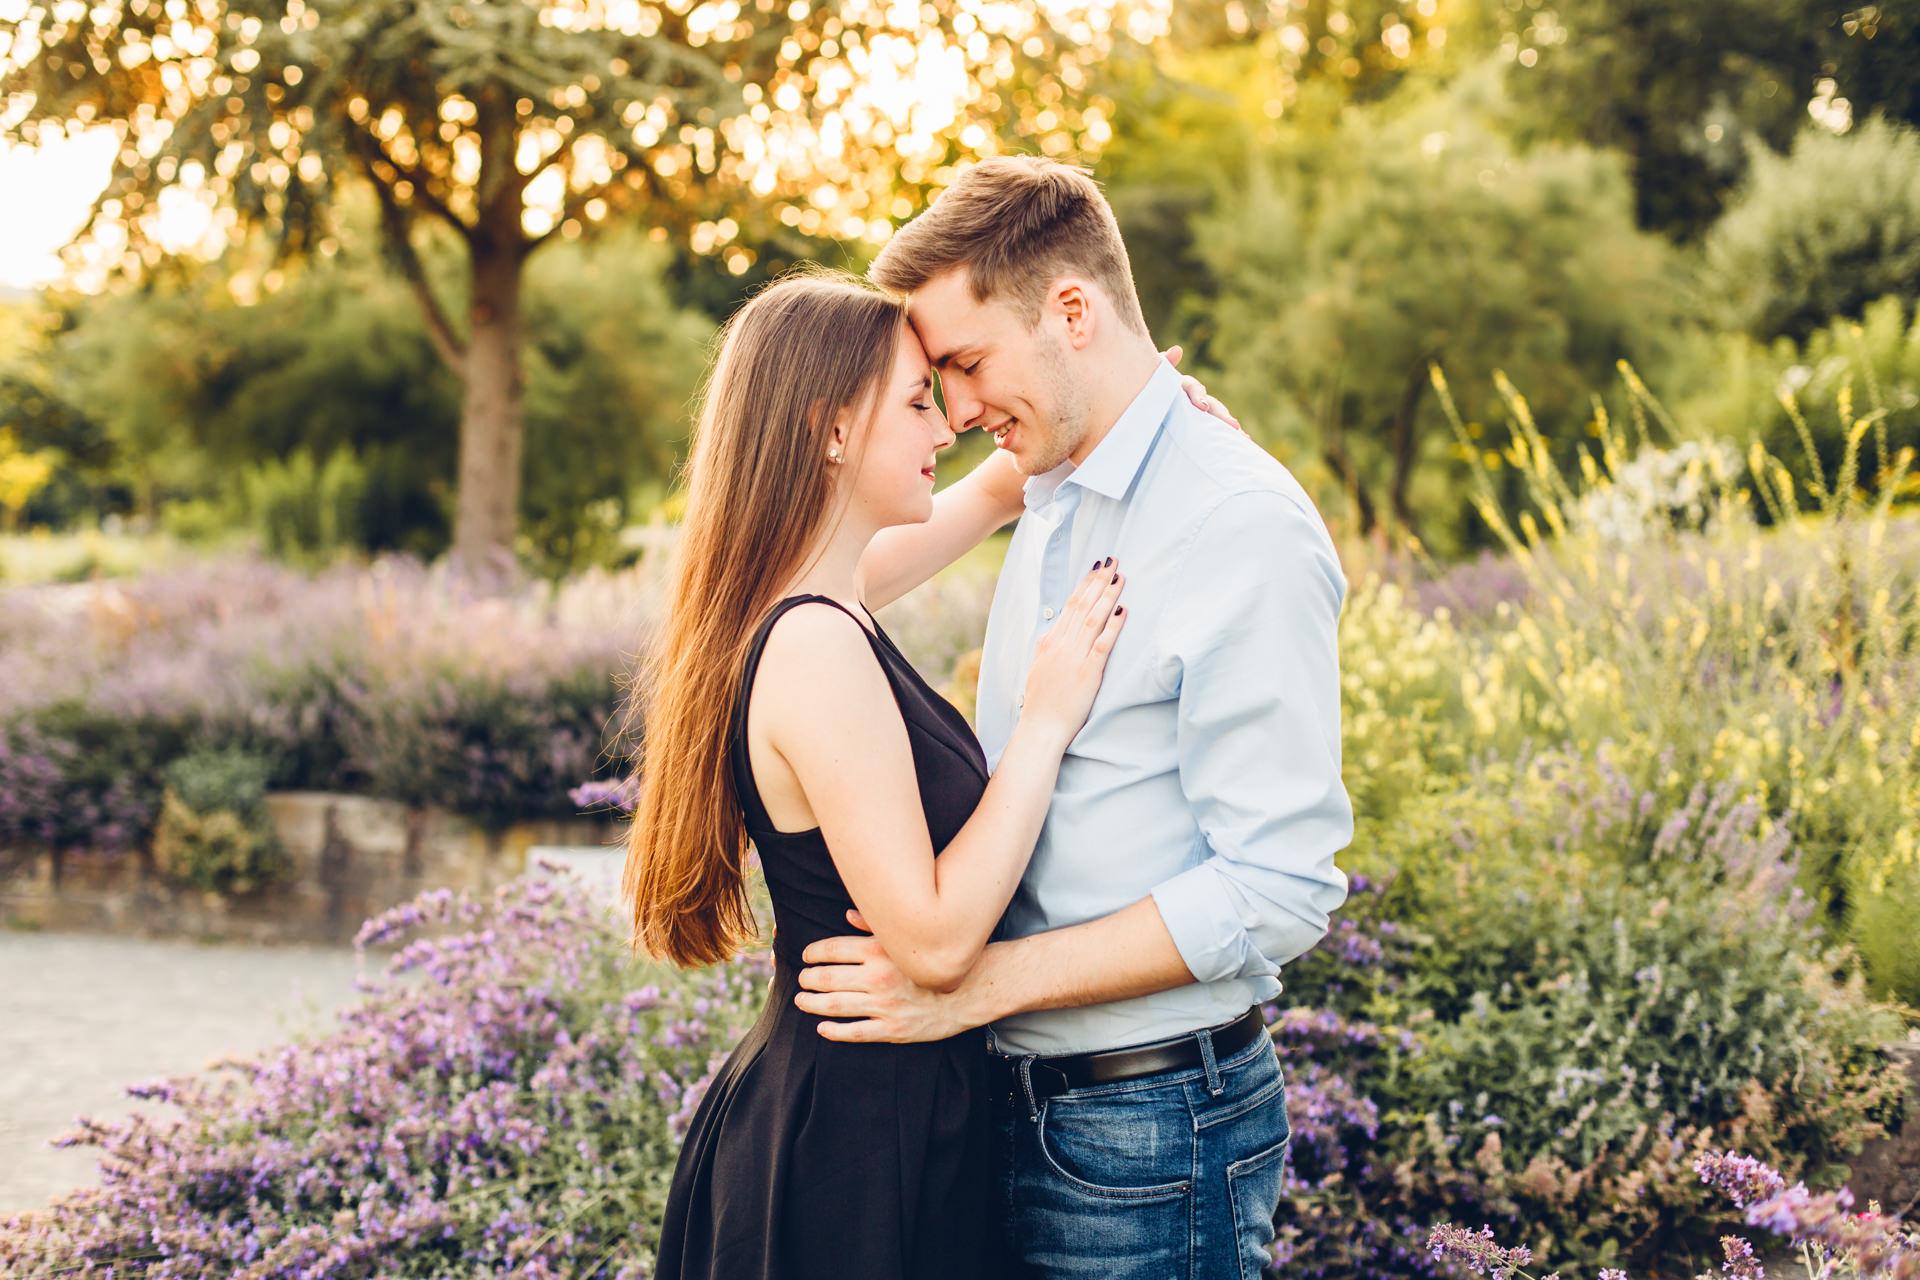 Fotograf Pirmasens Hochzeit Verlobung Strecktalpark